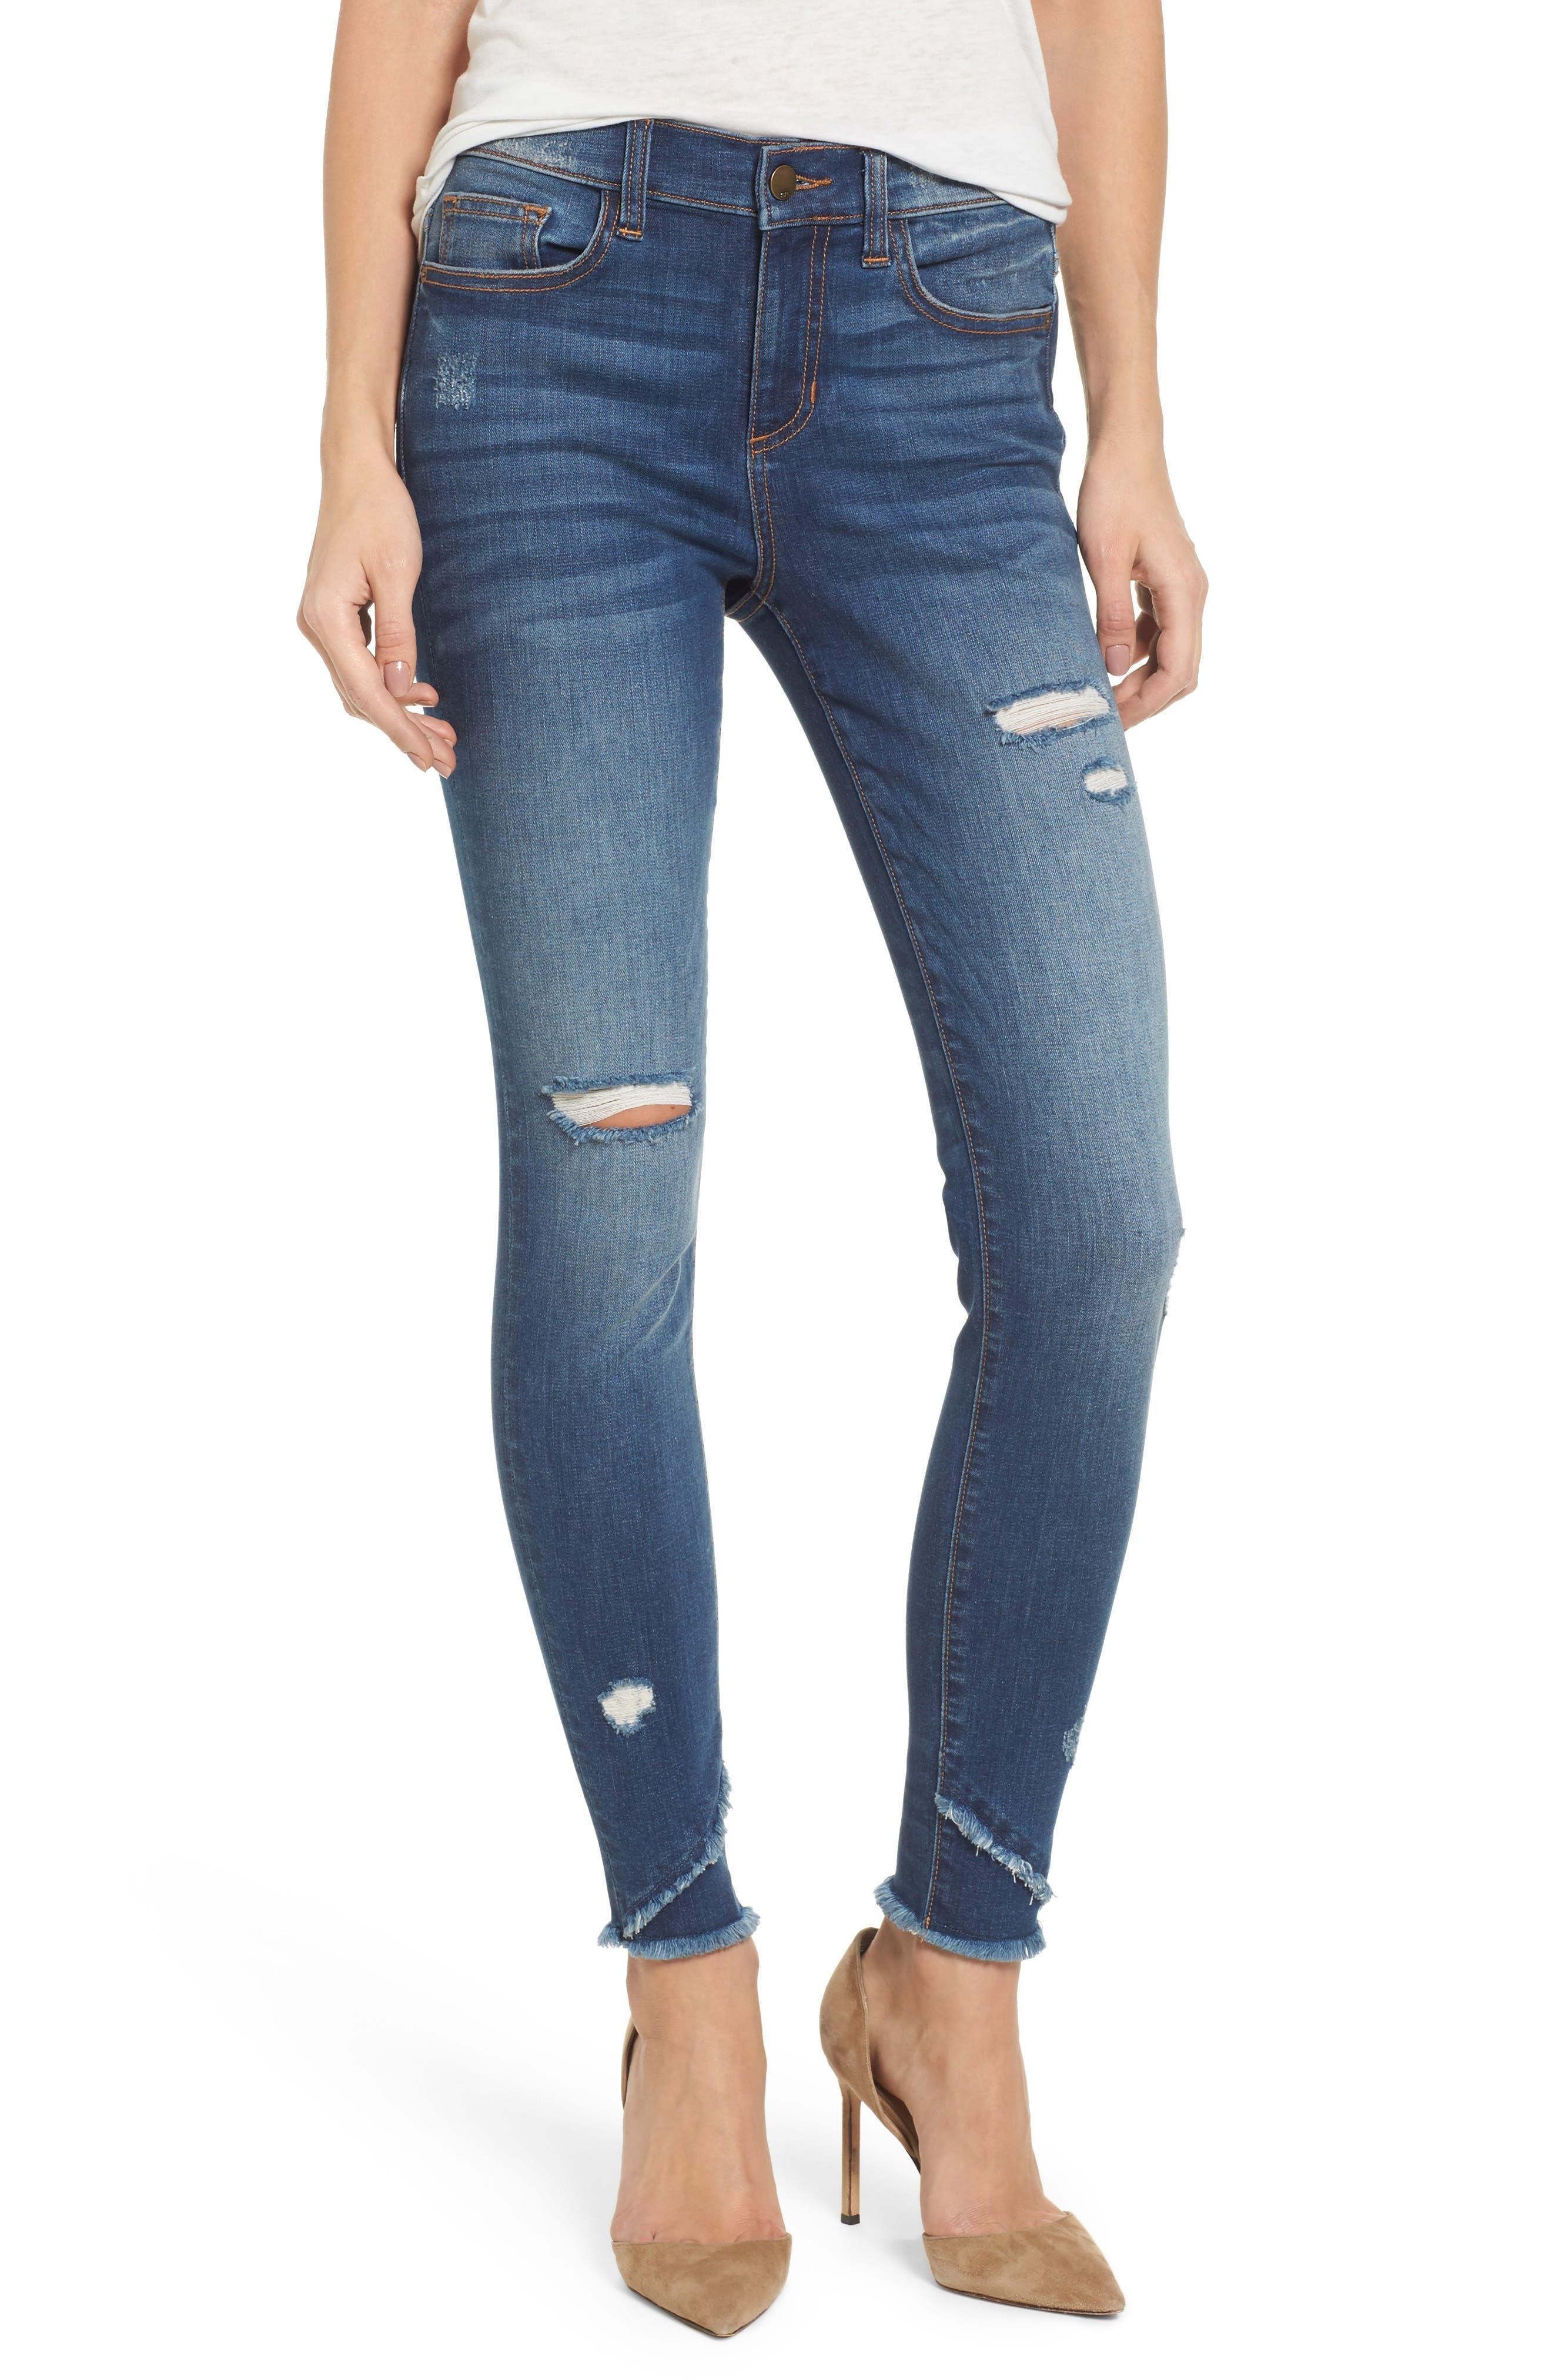 SP Black Ripped Skinny Jeans